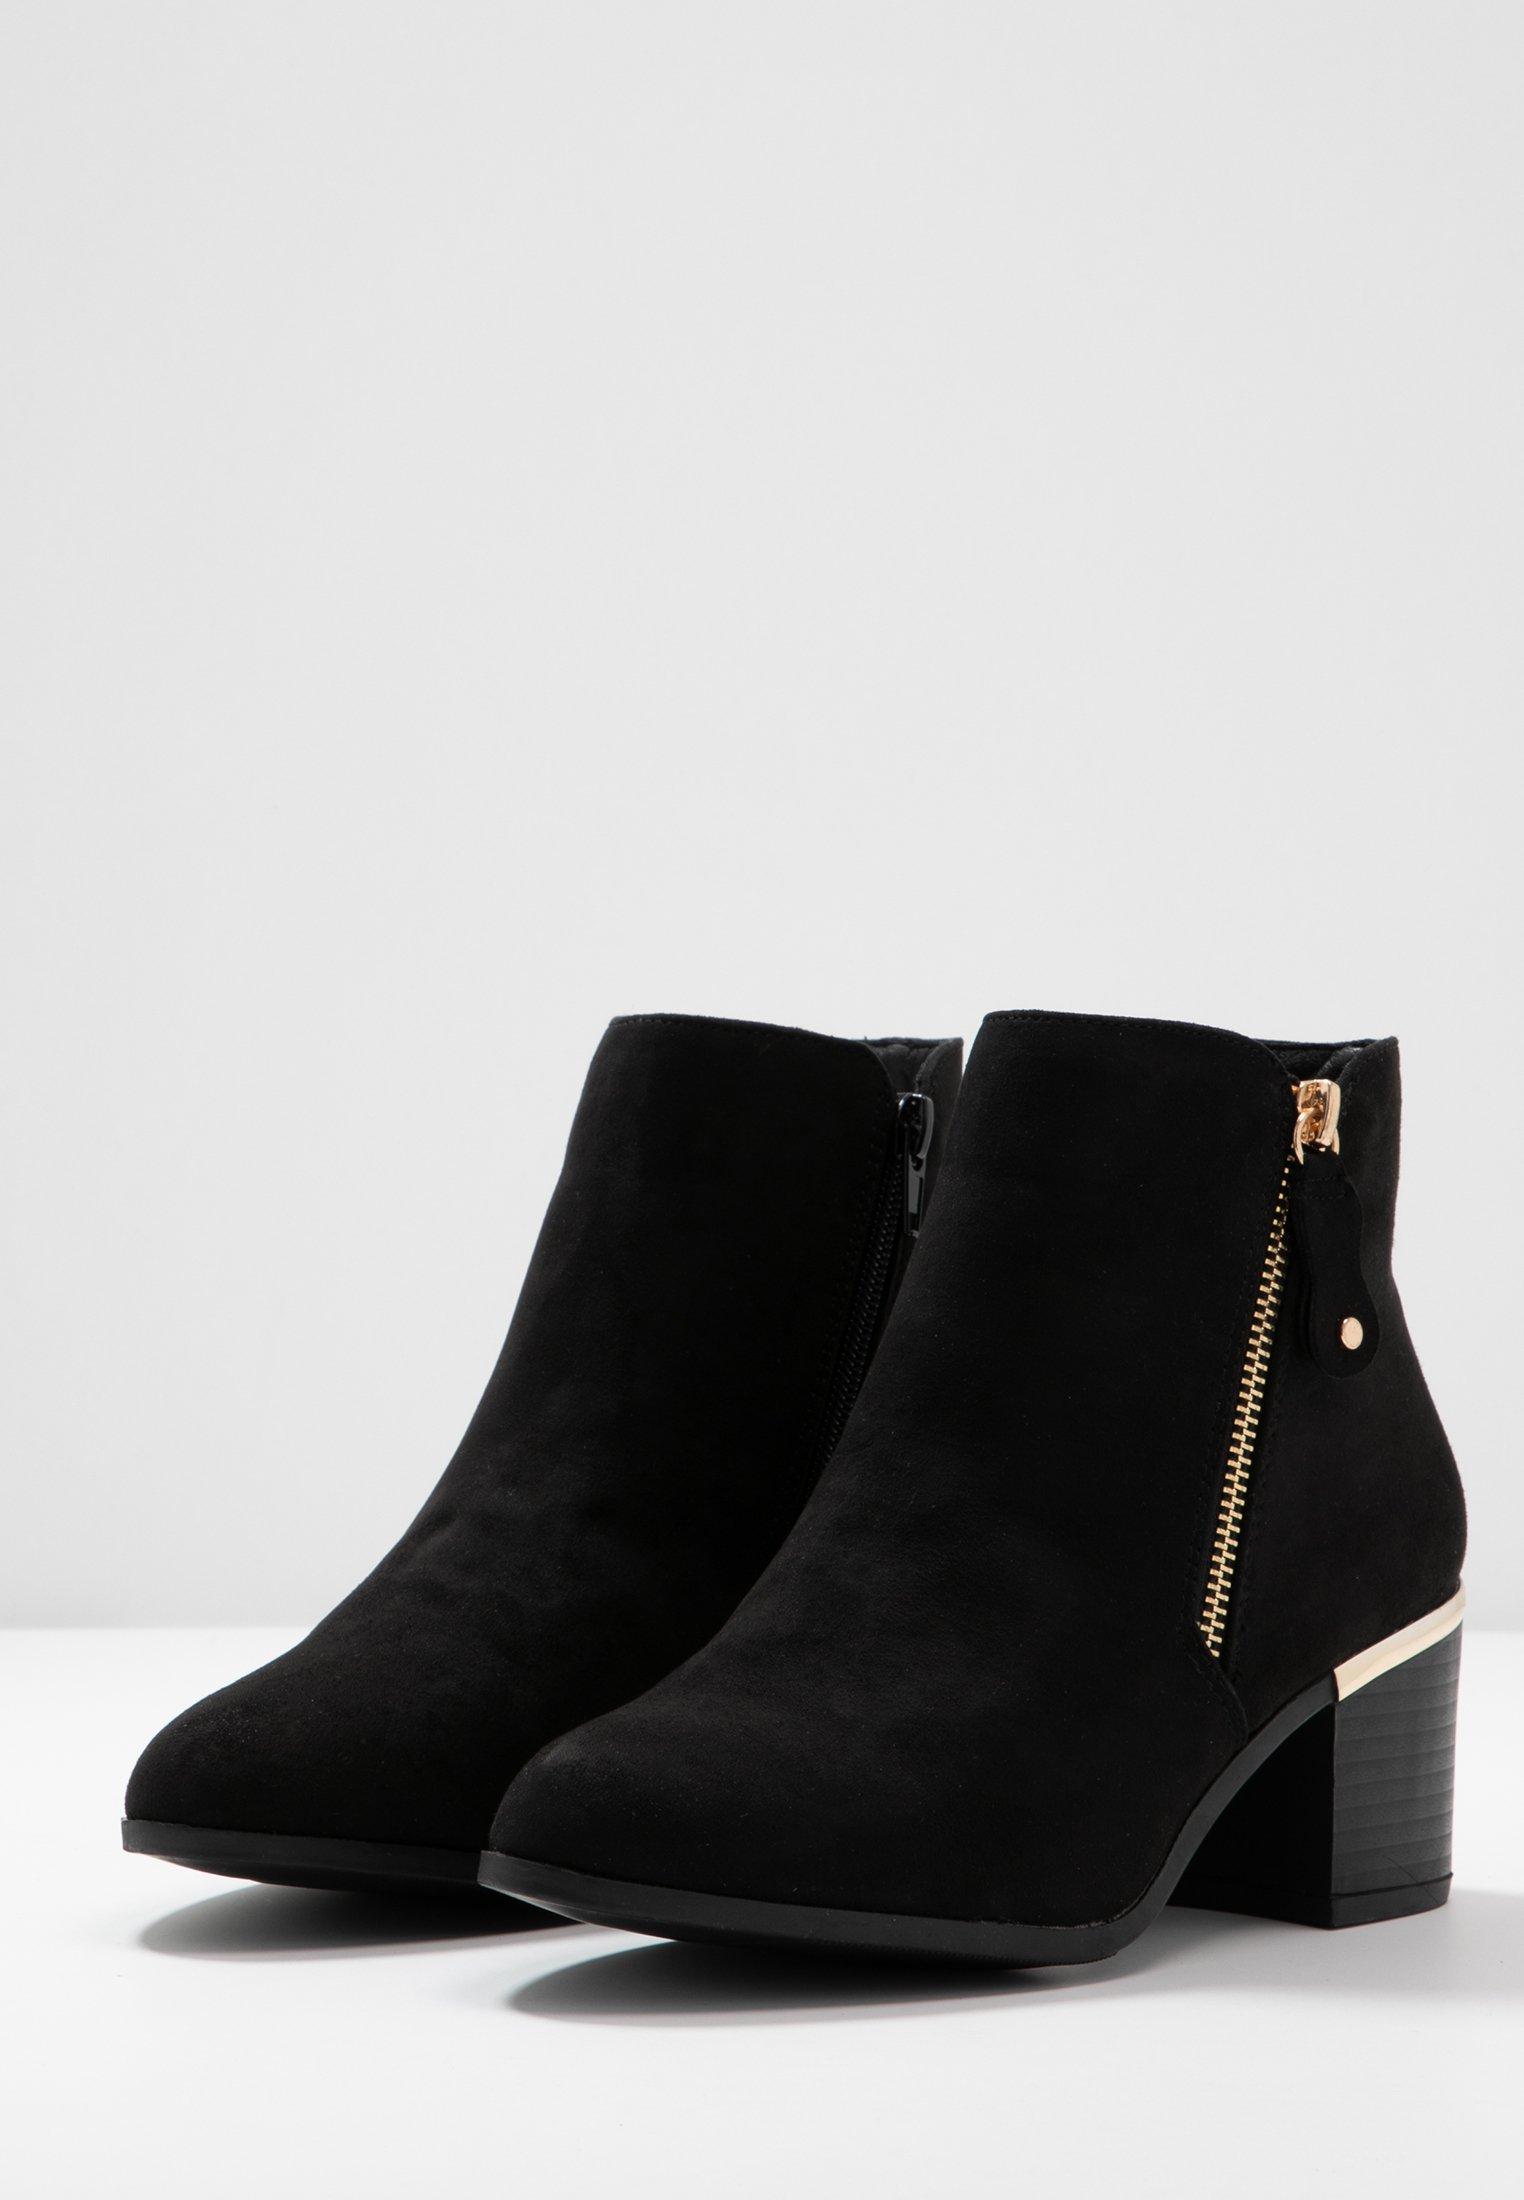 ClaretTronchetti New Black Wide Fit Look v8NwOm0n